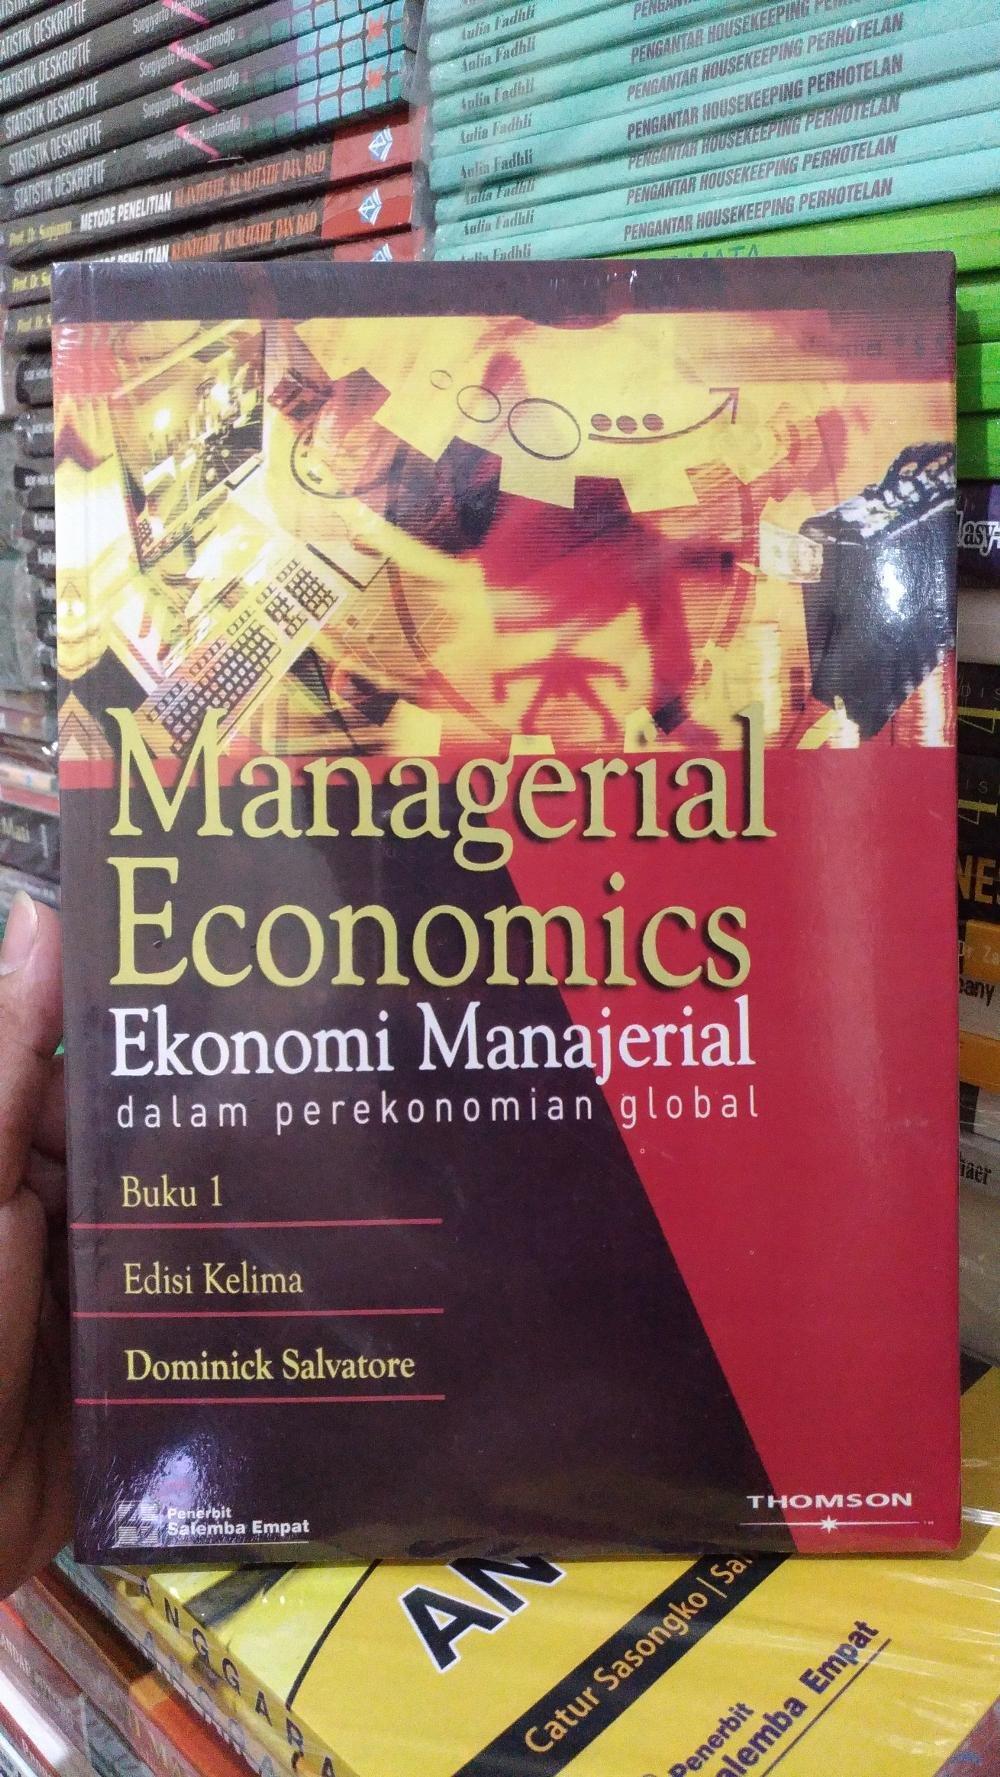 Buy Sell Cheapest Ilmu Mikro Ekonomi Best Quality Product Deals Teori Makro Pratama Buku Manajerial 1 E5 Dominick Salvatore